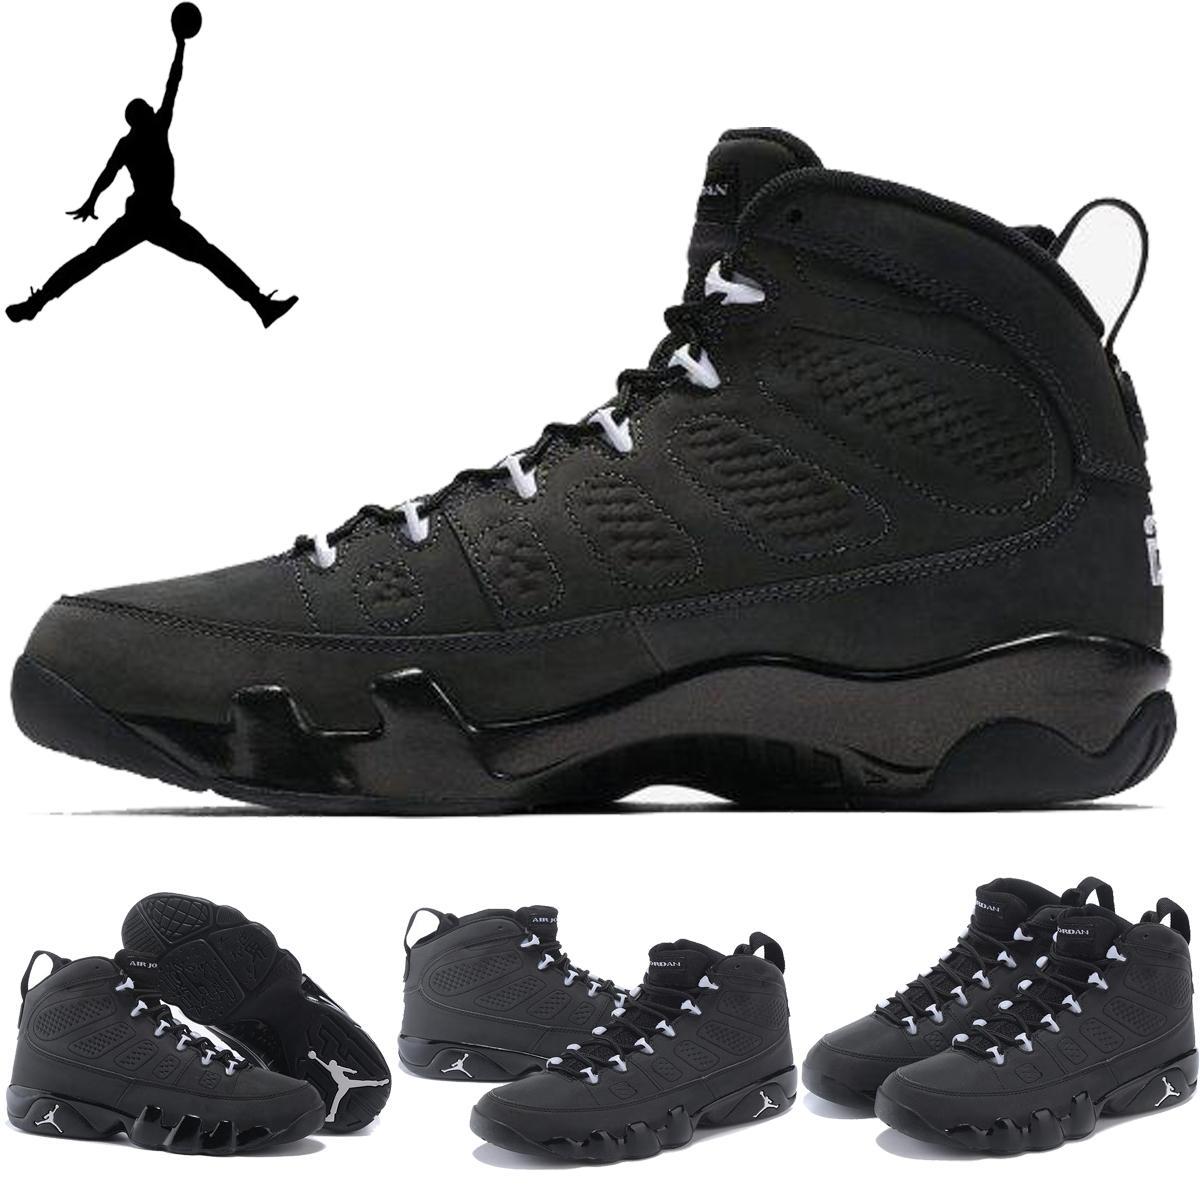 daaf01524c0 air jordan 9 retro anthracite men\u0026#39;s shoes | Little Giant